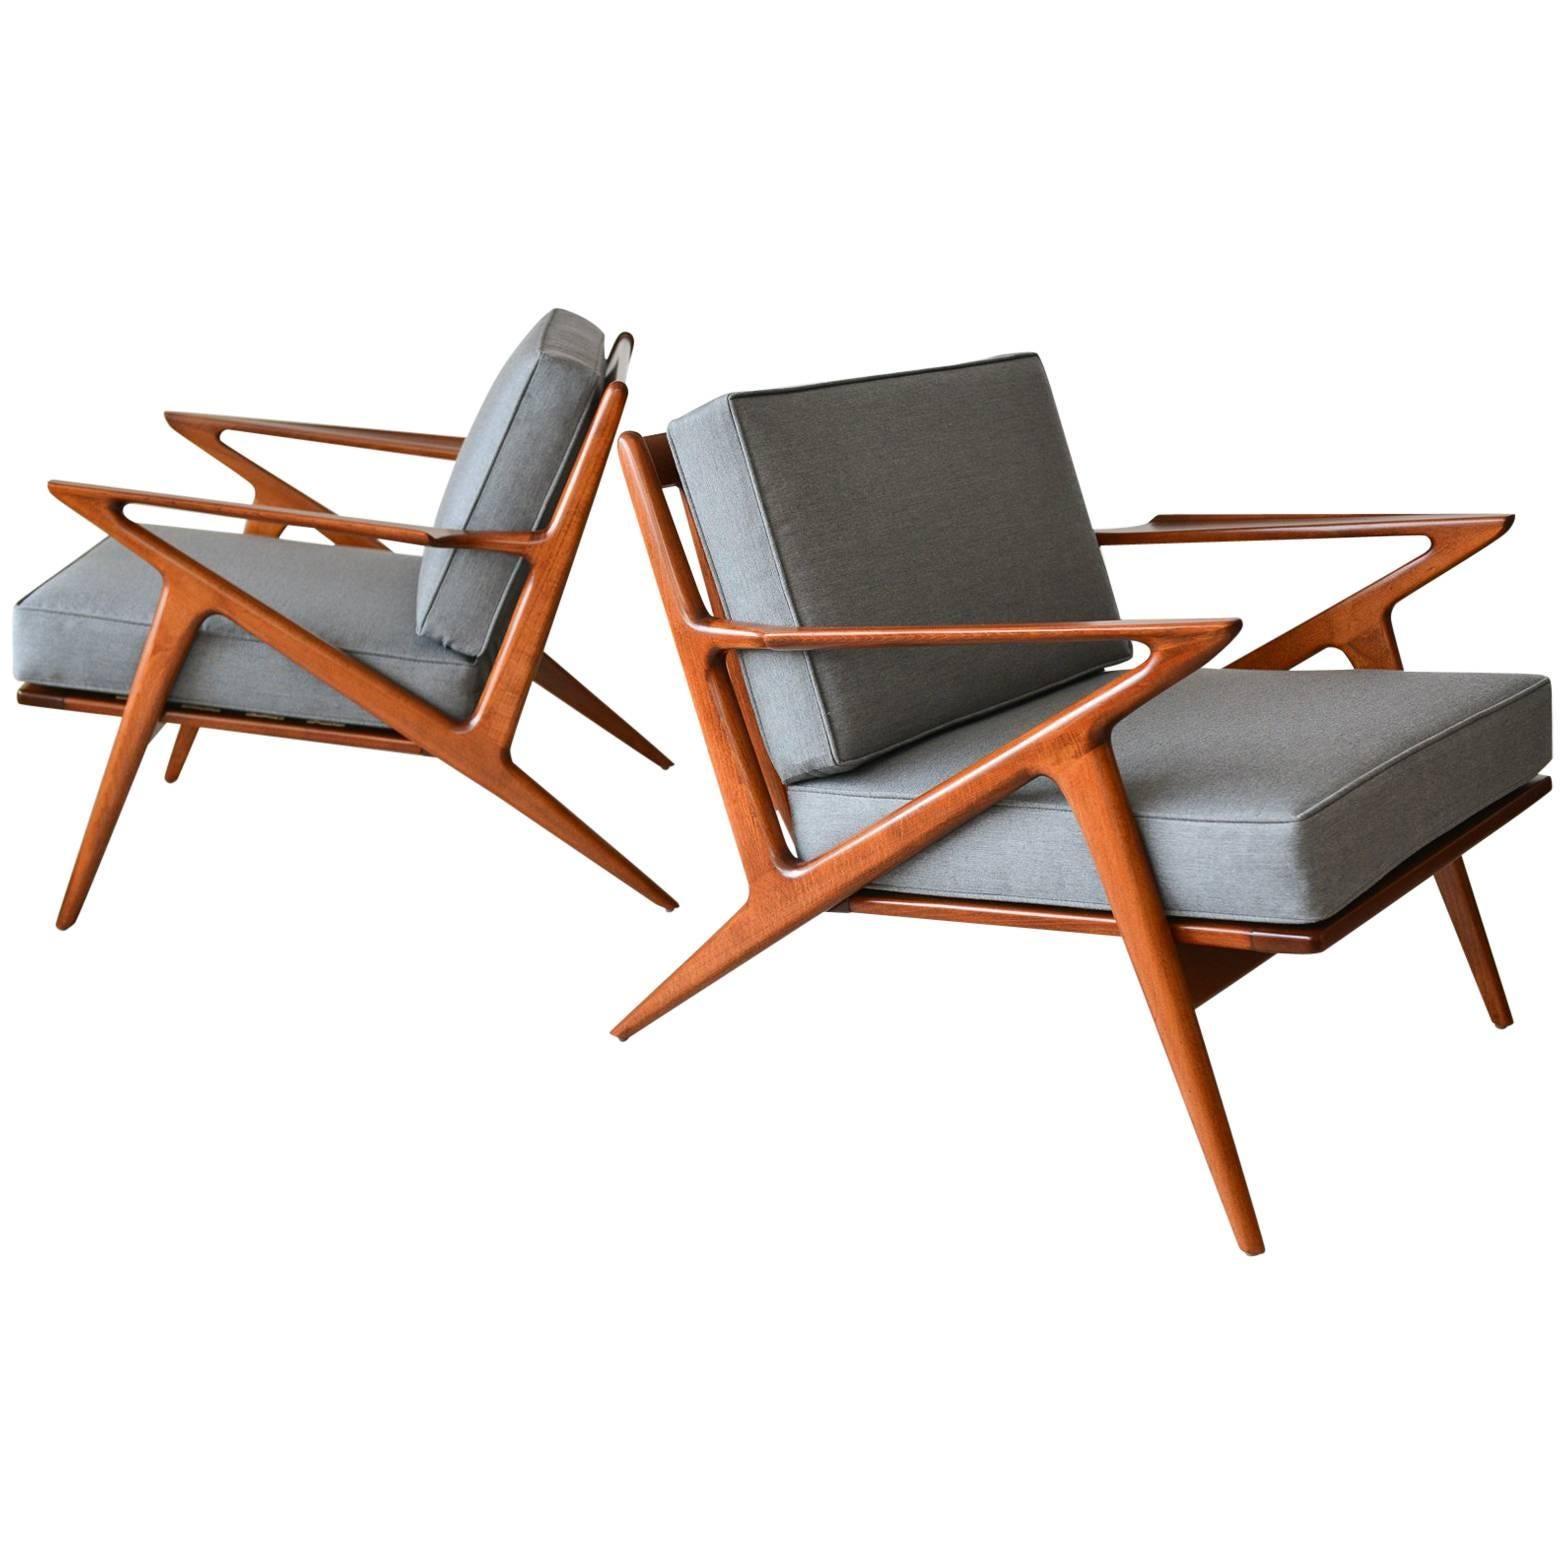 Pair Of Original Poul Jensen U0027Zu0027 Chairs By Selig, Circa 1960